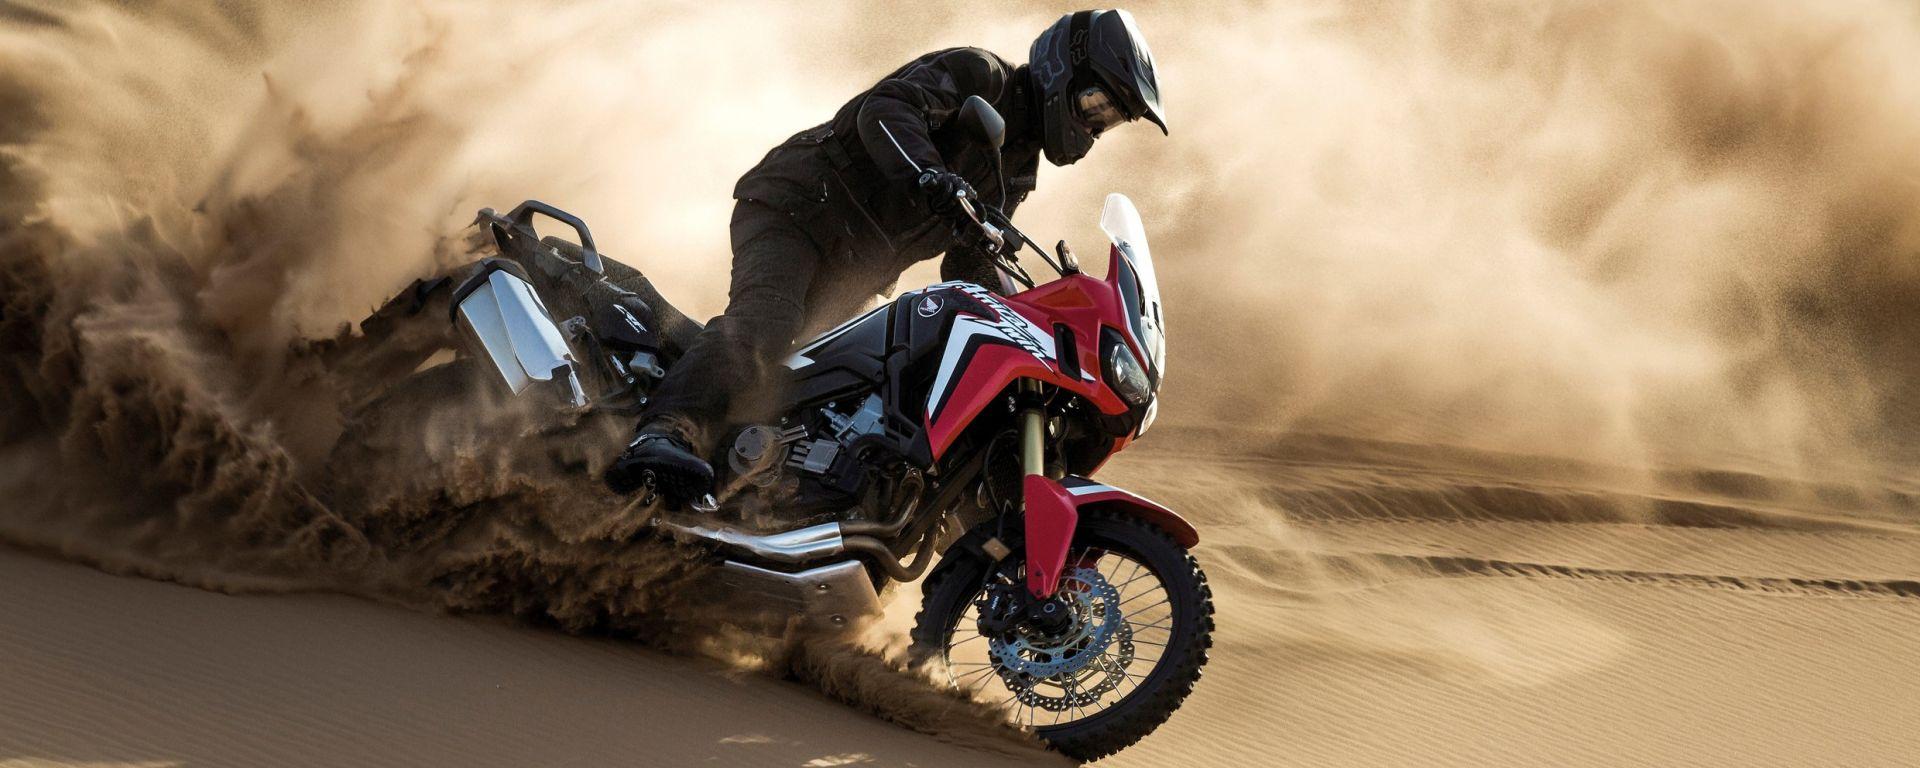 Honda CRF1000L Africa Twin: nuove immagini e video